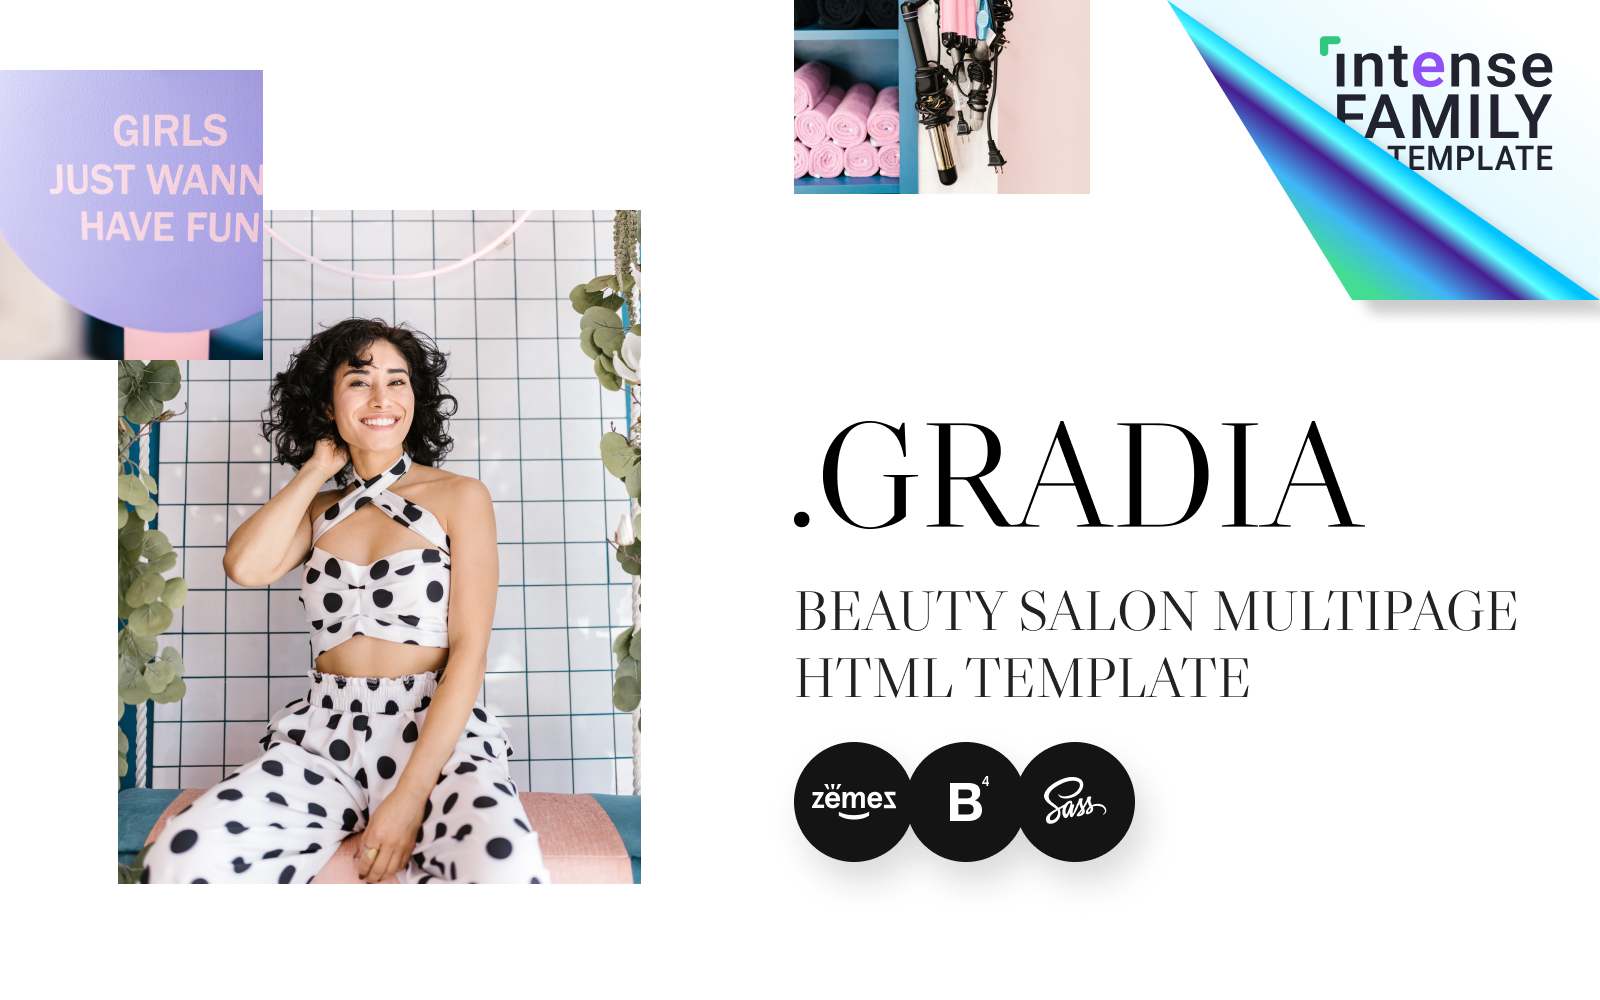 Gradia - Beauty Salon HTML5 Website Template